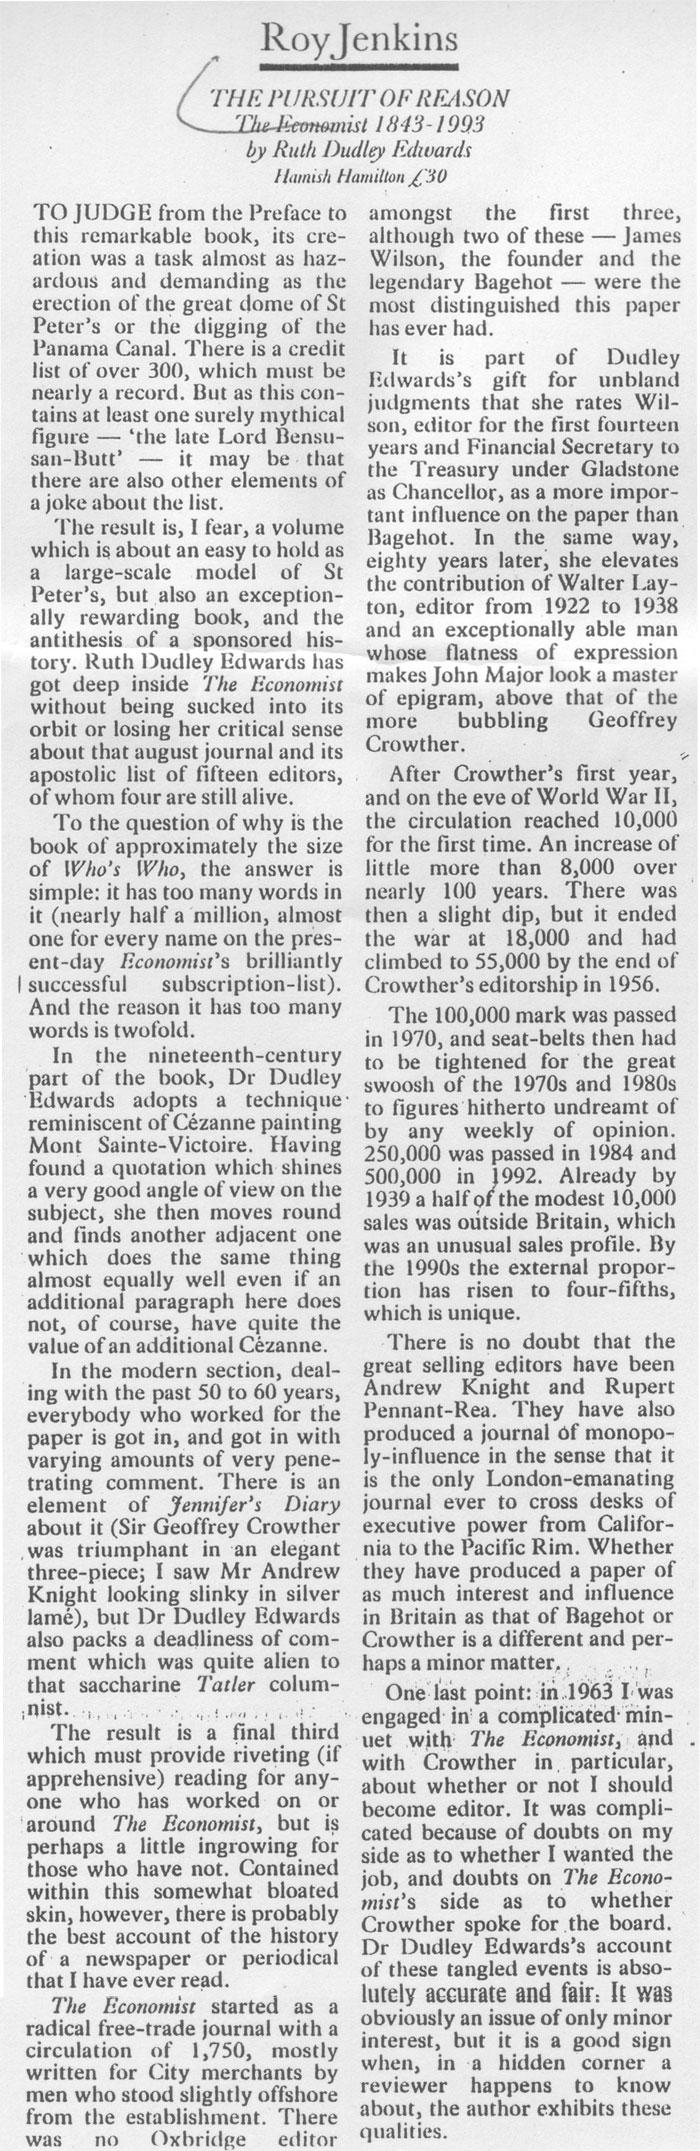 Observer review by Joy Jenkins